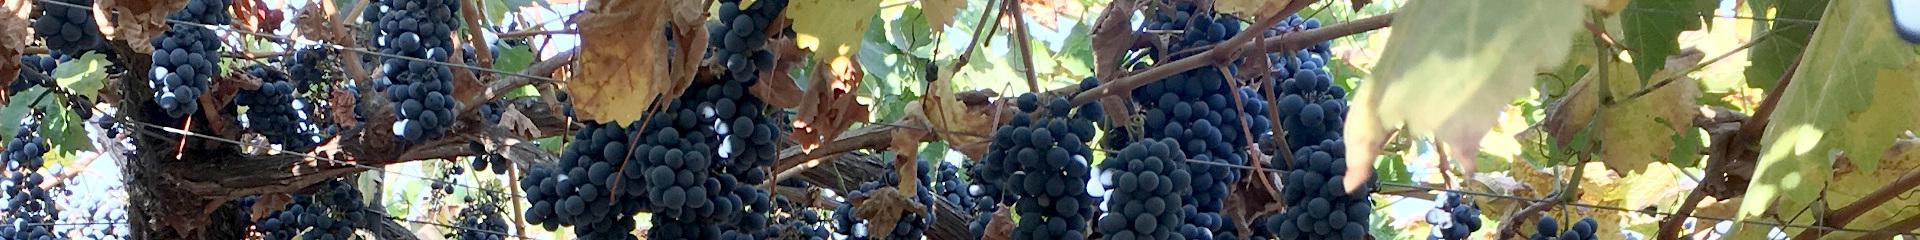 Tandem Process Partner - Vigne